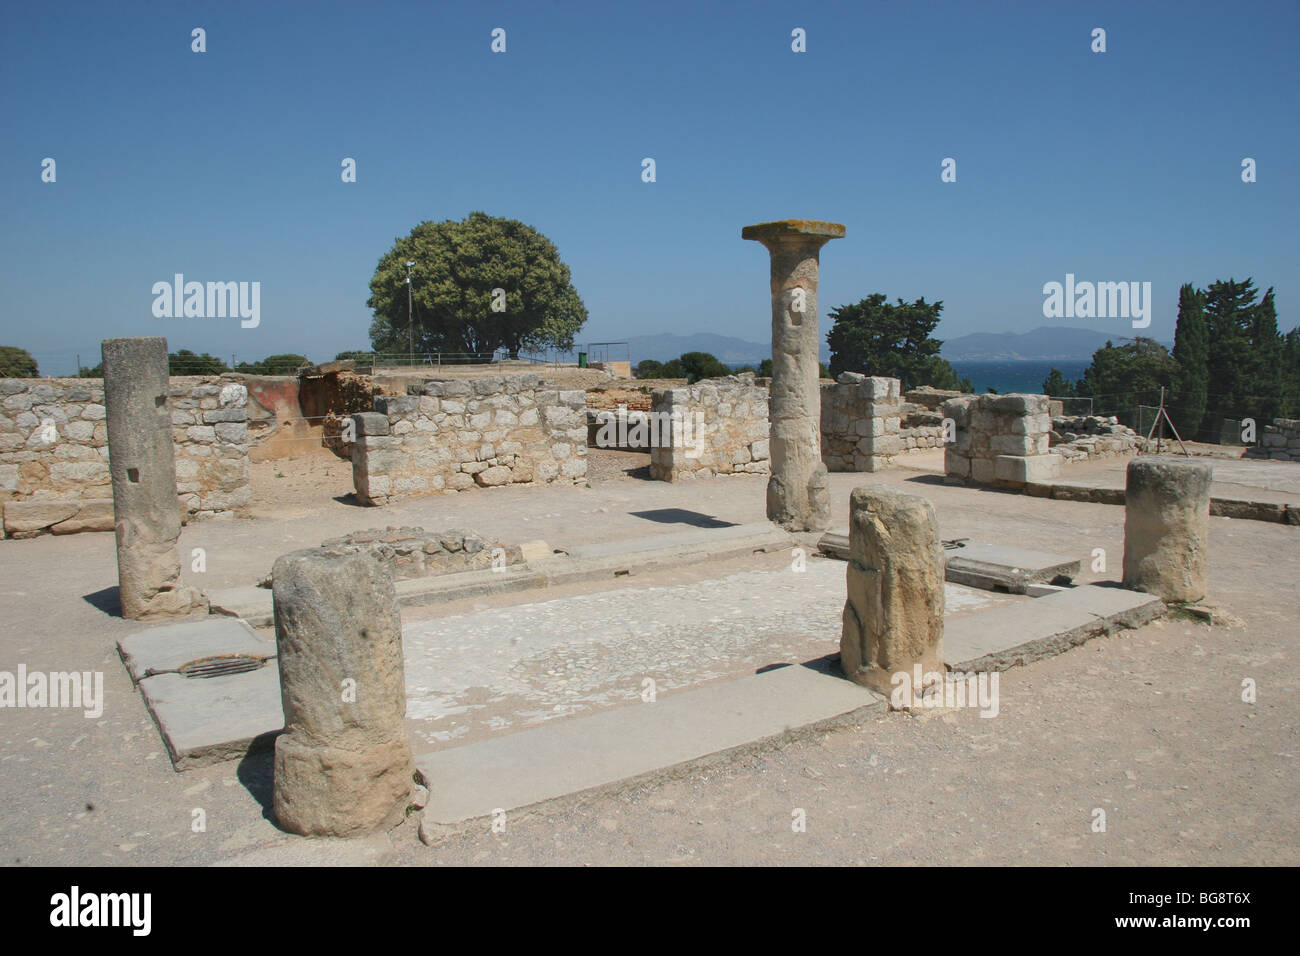 Roman Art. Emporiare (Ampurias). Roman city. House of the peristyle (Second century AD). Girona province. Catalonia. - Stock Image